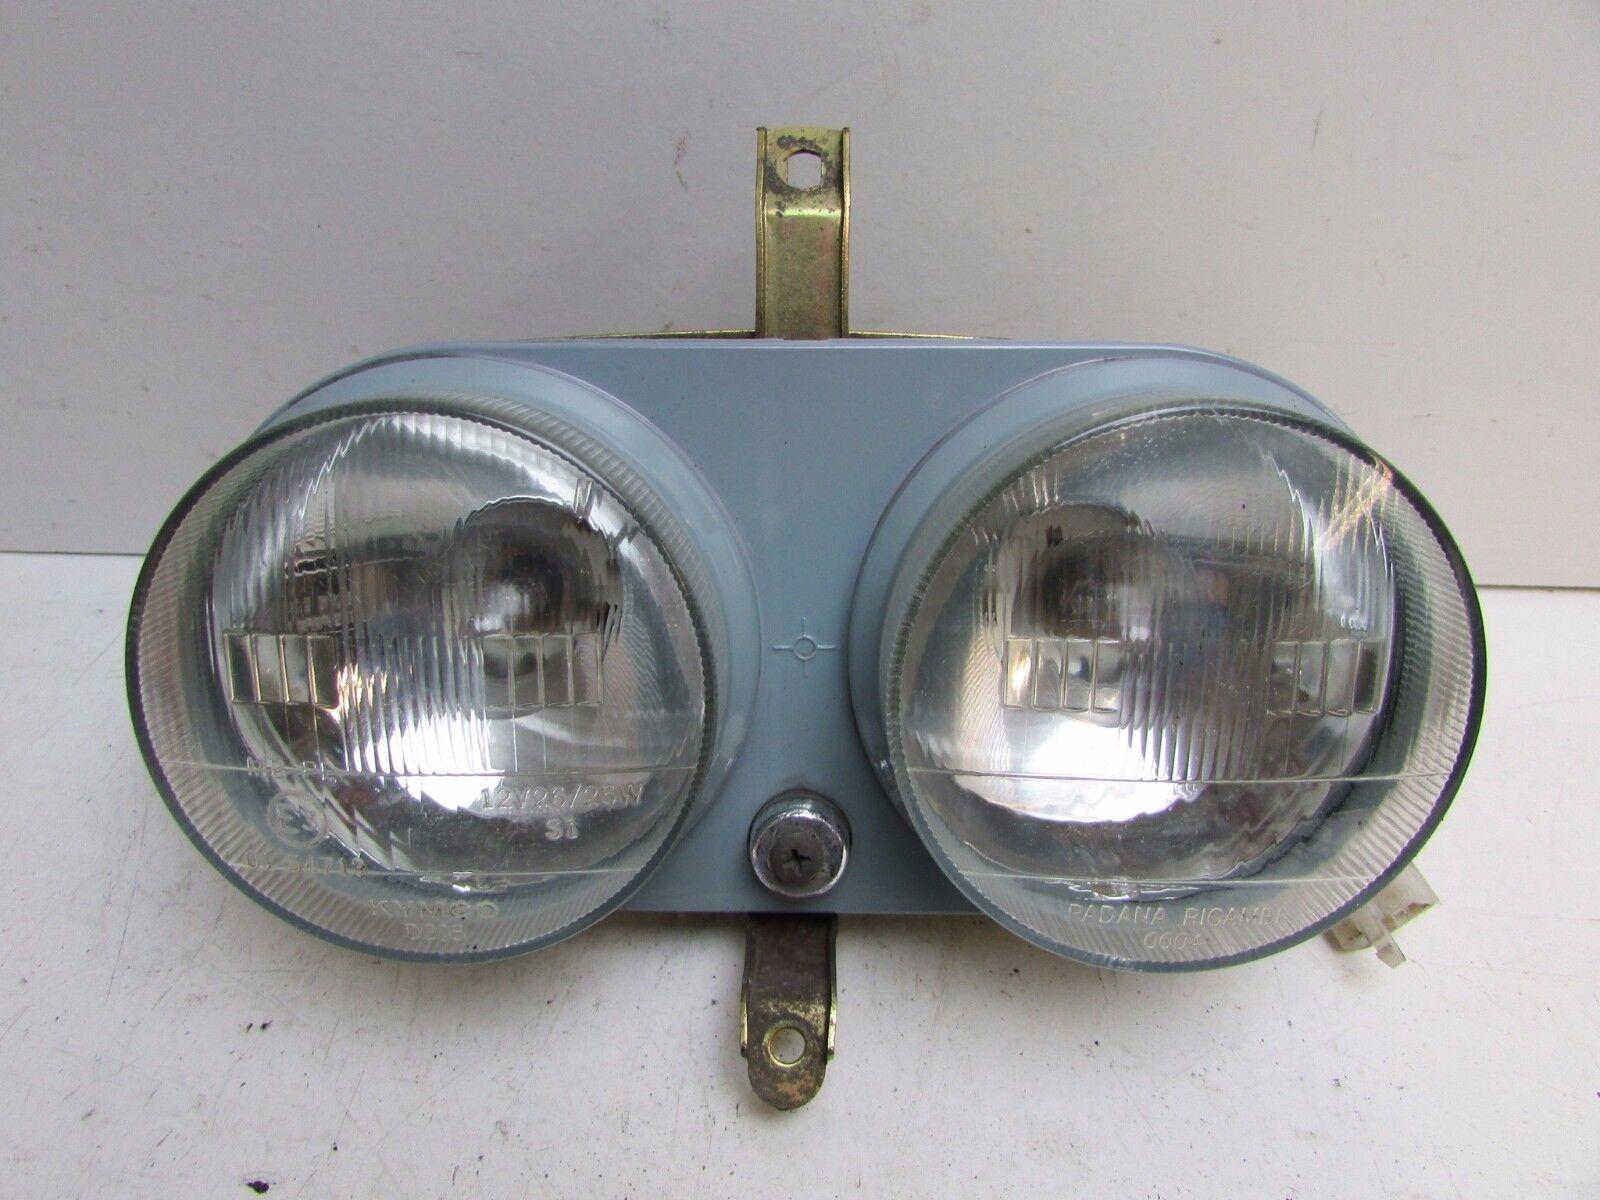 Kymco Cobra 50 1997 - 1999 Front Headlight Head Light Lamp Assembly